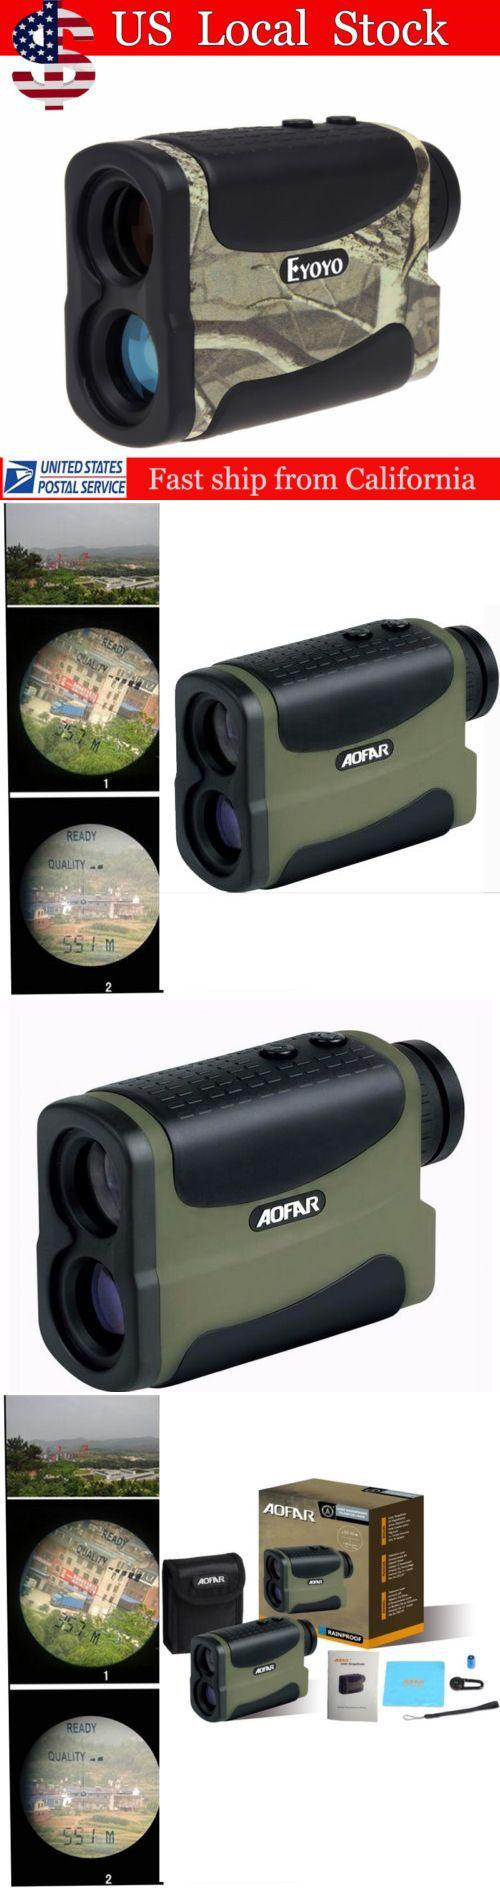 Range Finders 31712: Eyoyo Golf Huntinglaser Range Finder Telescope Distance Speed Measurer Green -> BUY IT NOW ONLY: $85.26 on eBay!